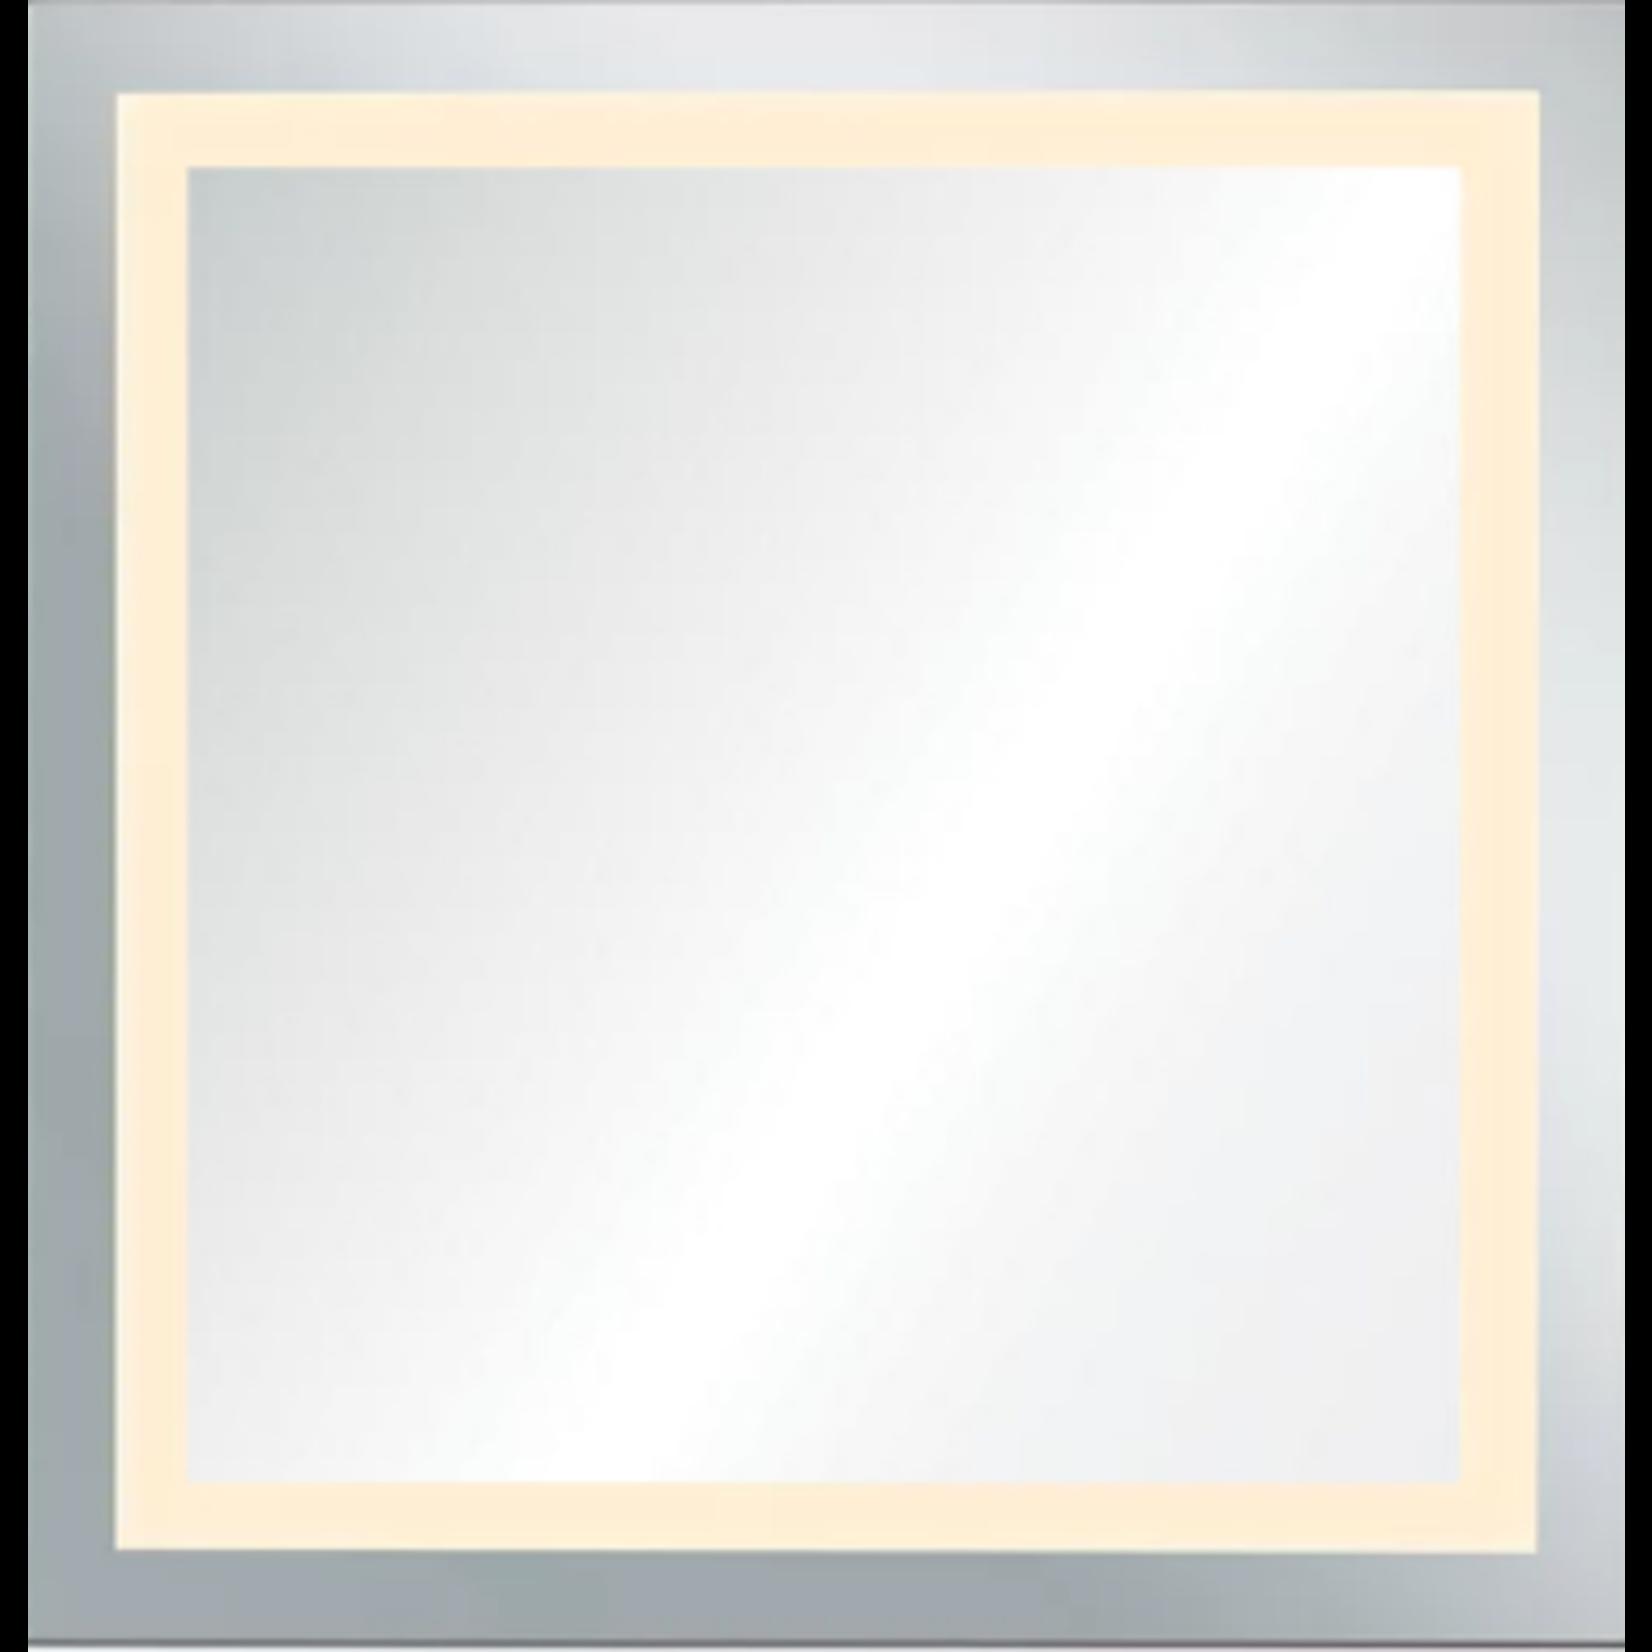 Miroir led Renwill 42x48